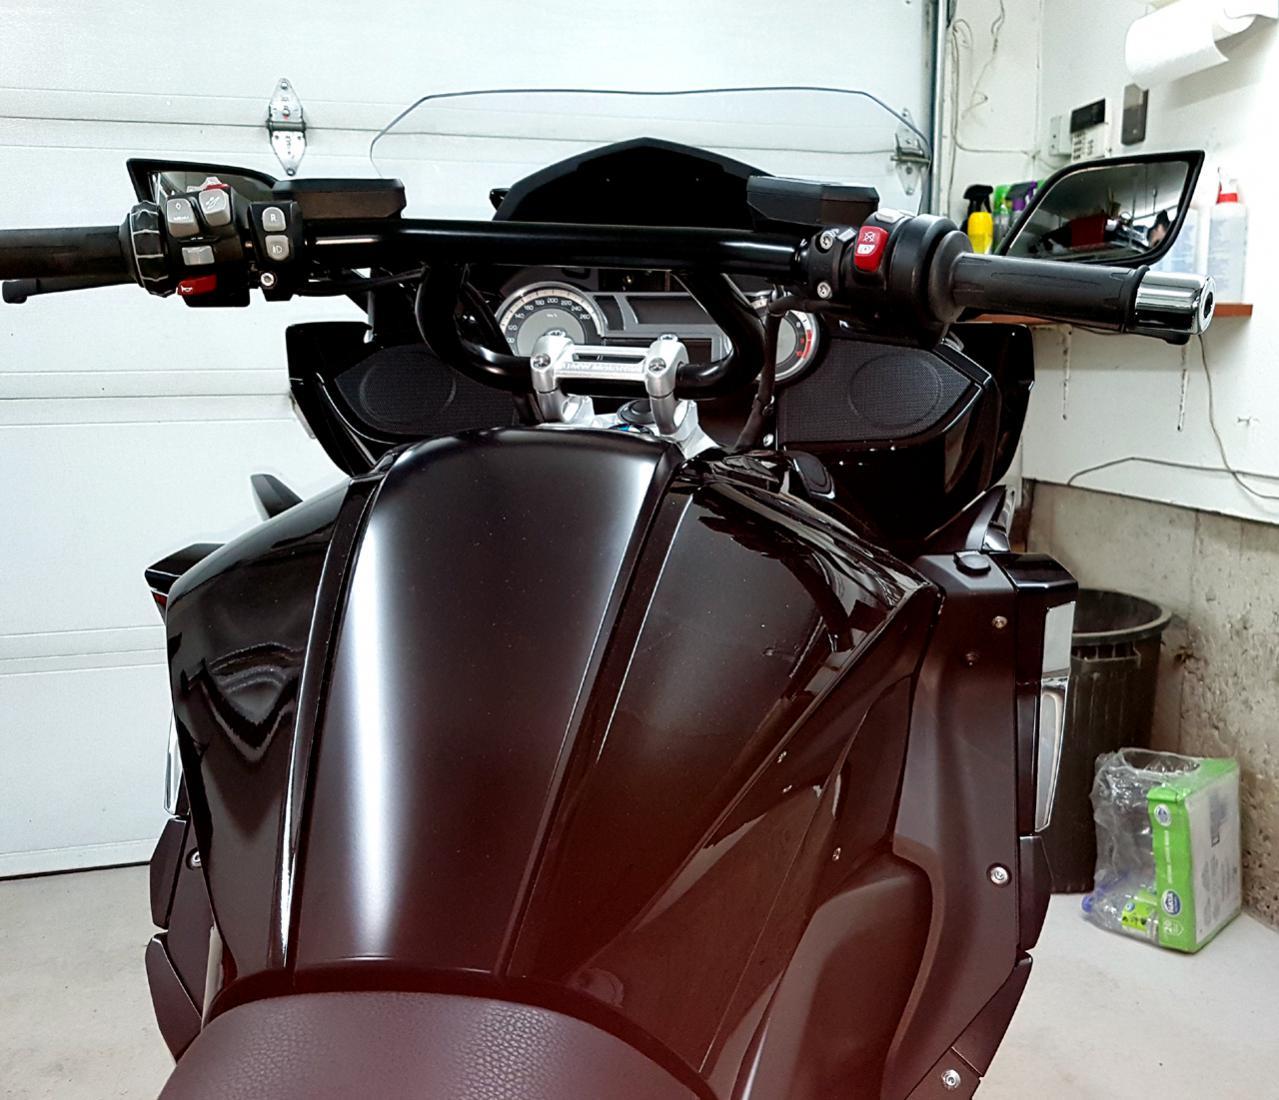 K1600B fairing removal - BMW K1600 Forum : BMW K1600 GT and GTL Forums